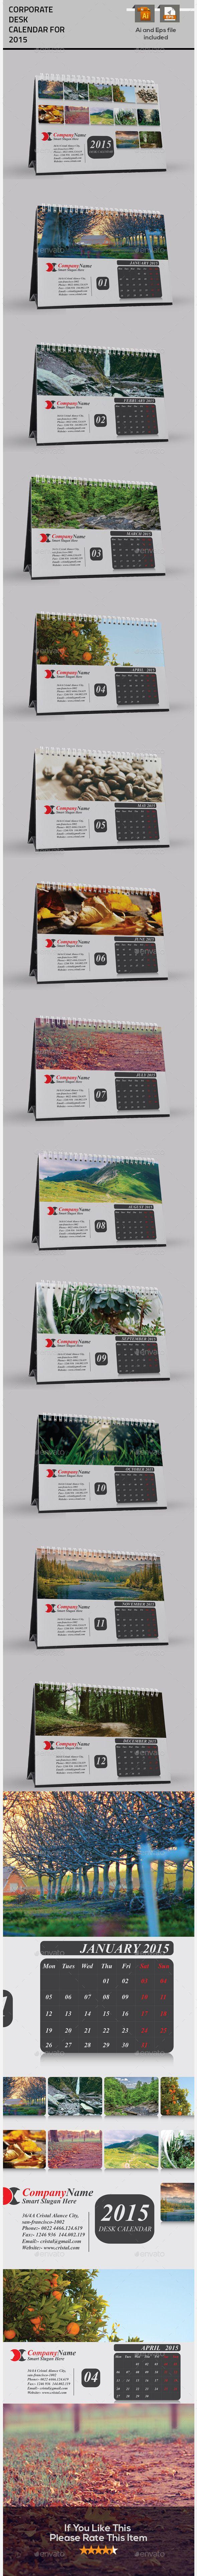 Nice Desktop Calendar For 2015 - Calendars Stationery